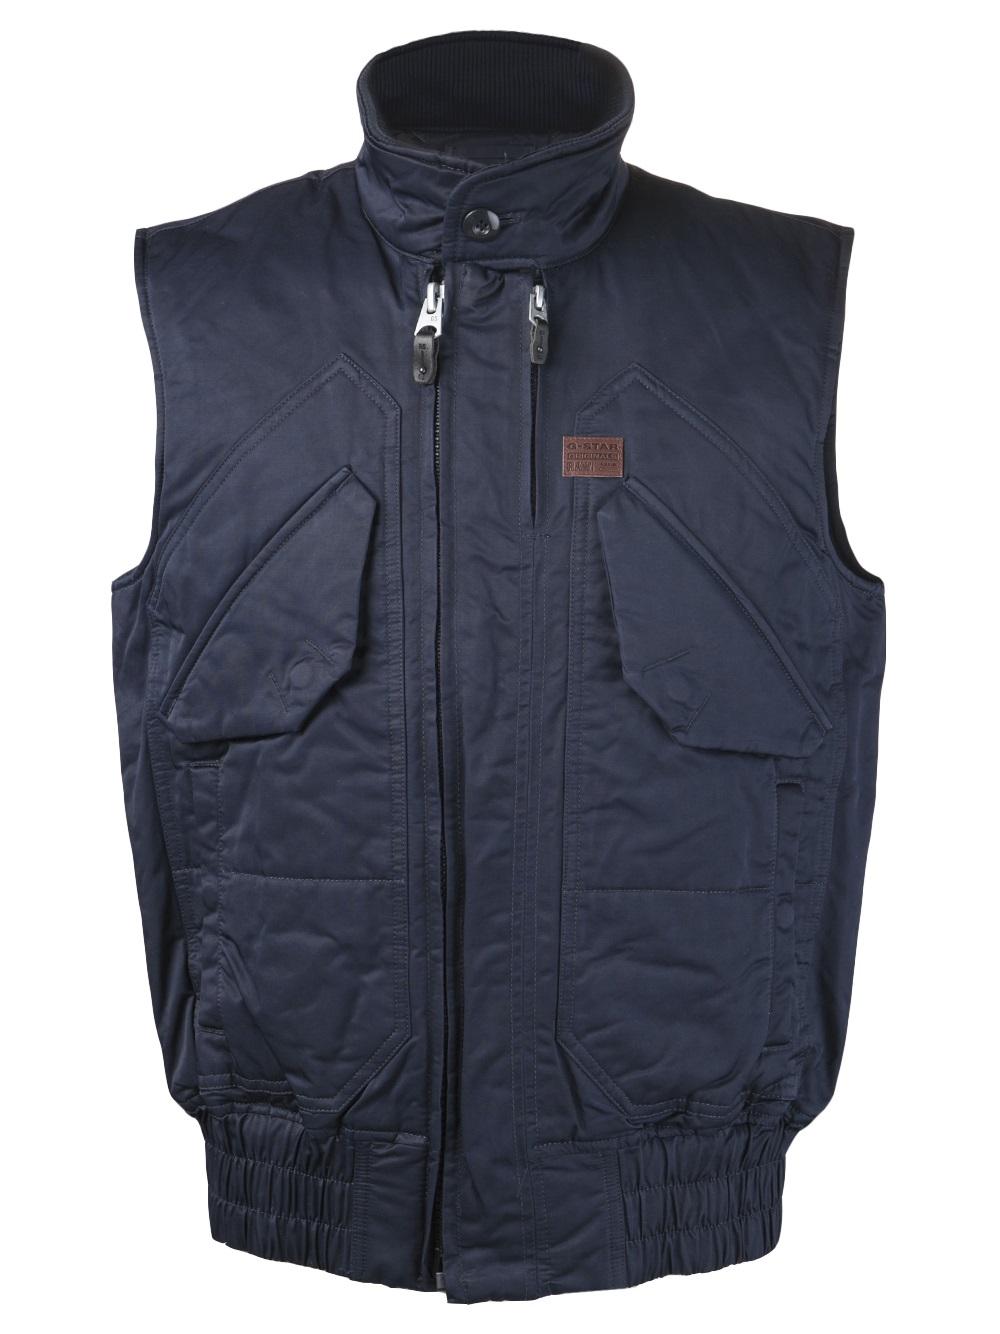 g star raw gstar atlas vest in blue for men lyst. Black Bedroom Furniture Sets. Home Design Ideas